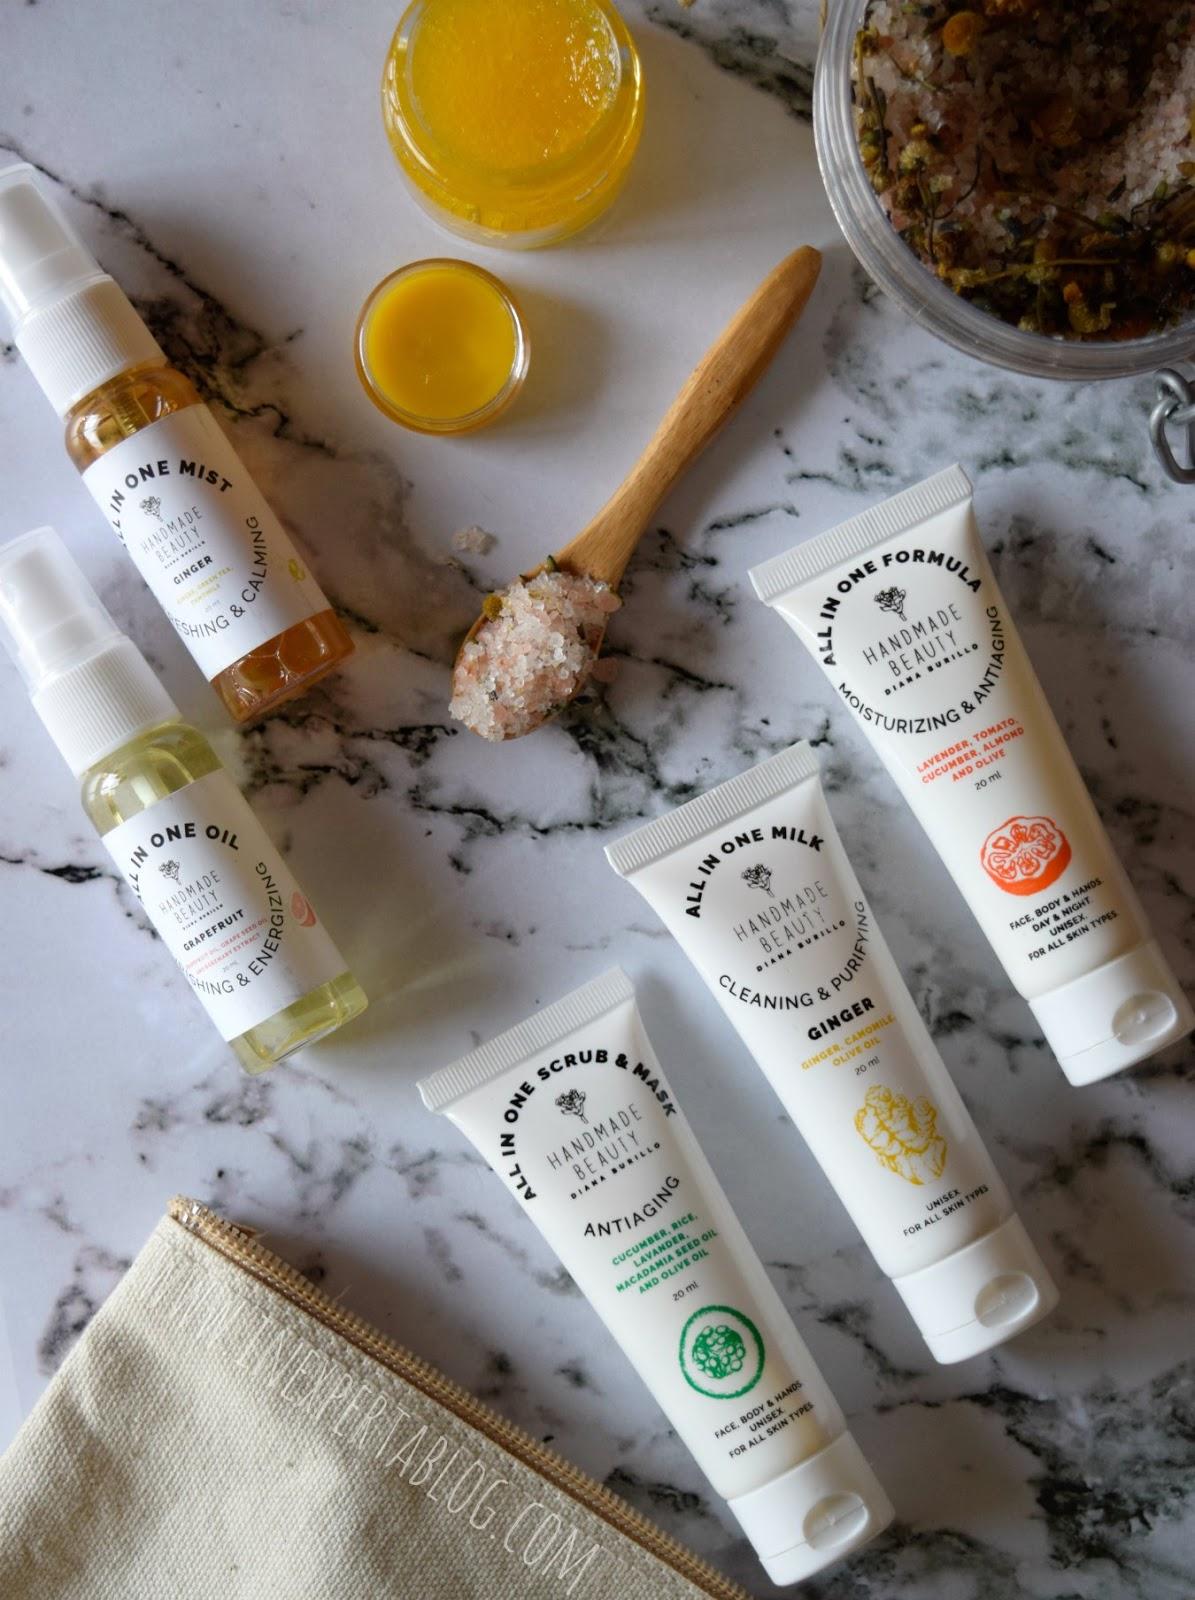 kit de minitallas para probar de la marca Hand Made Beauty vegana